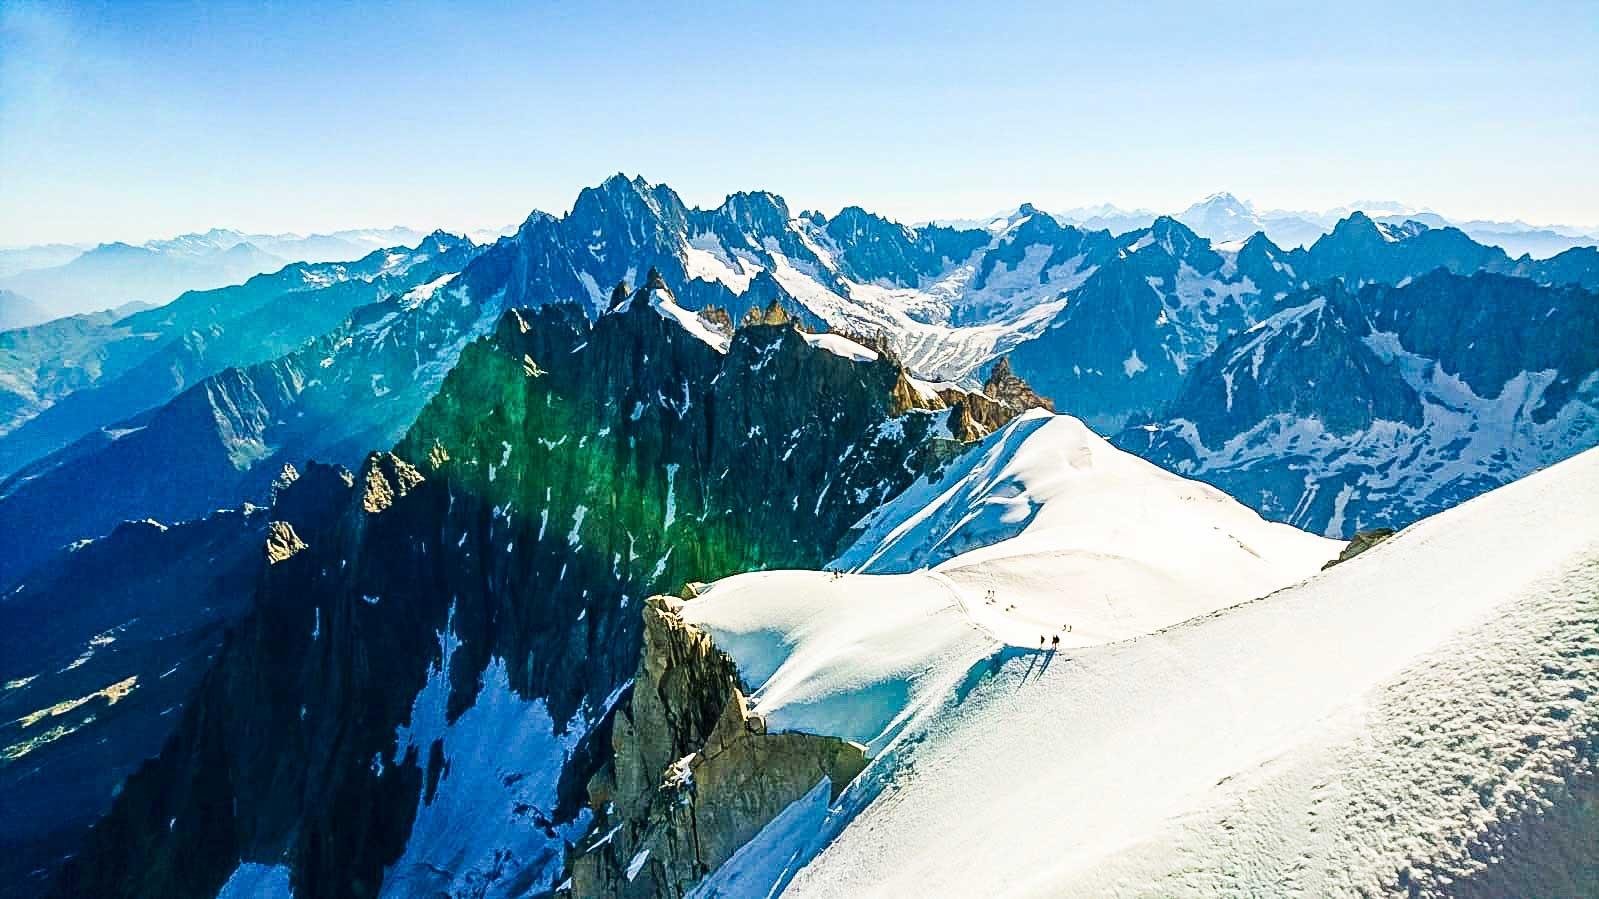 polaris-memovox-reaching-4000m-heigh-at-the-alpes-breithorn-1